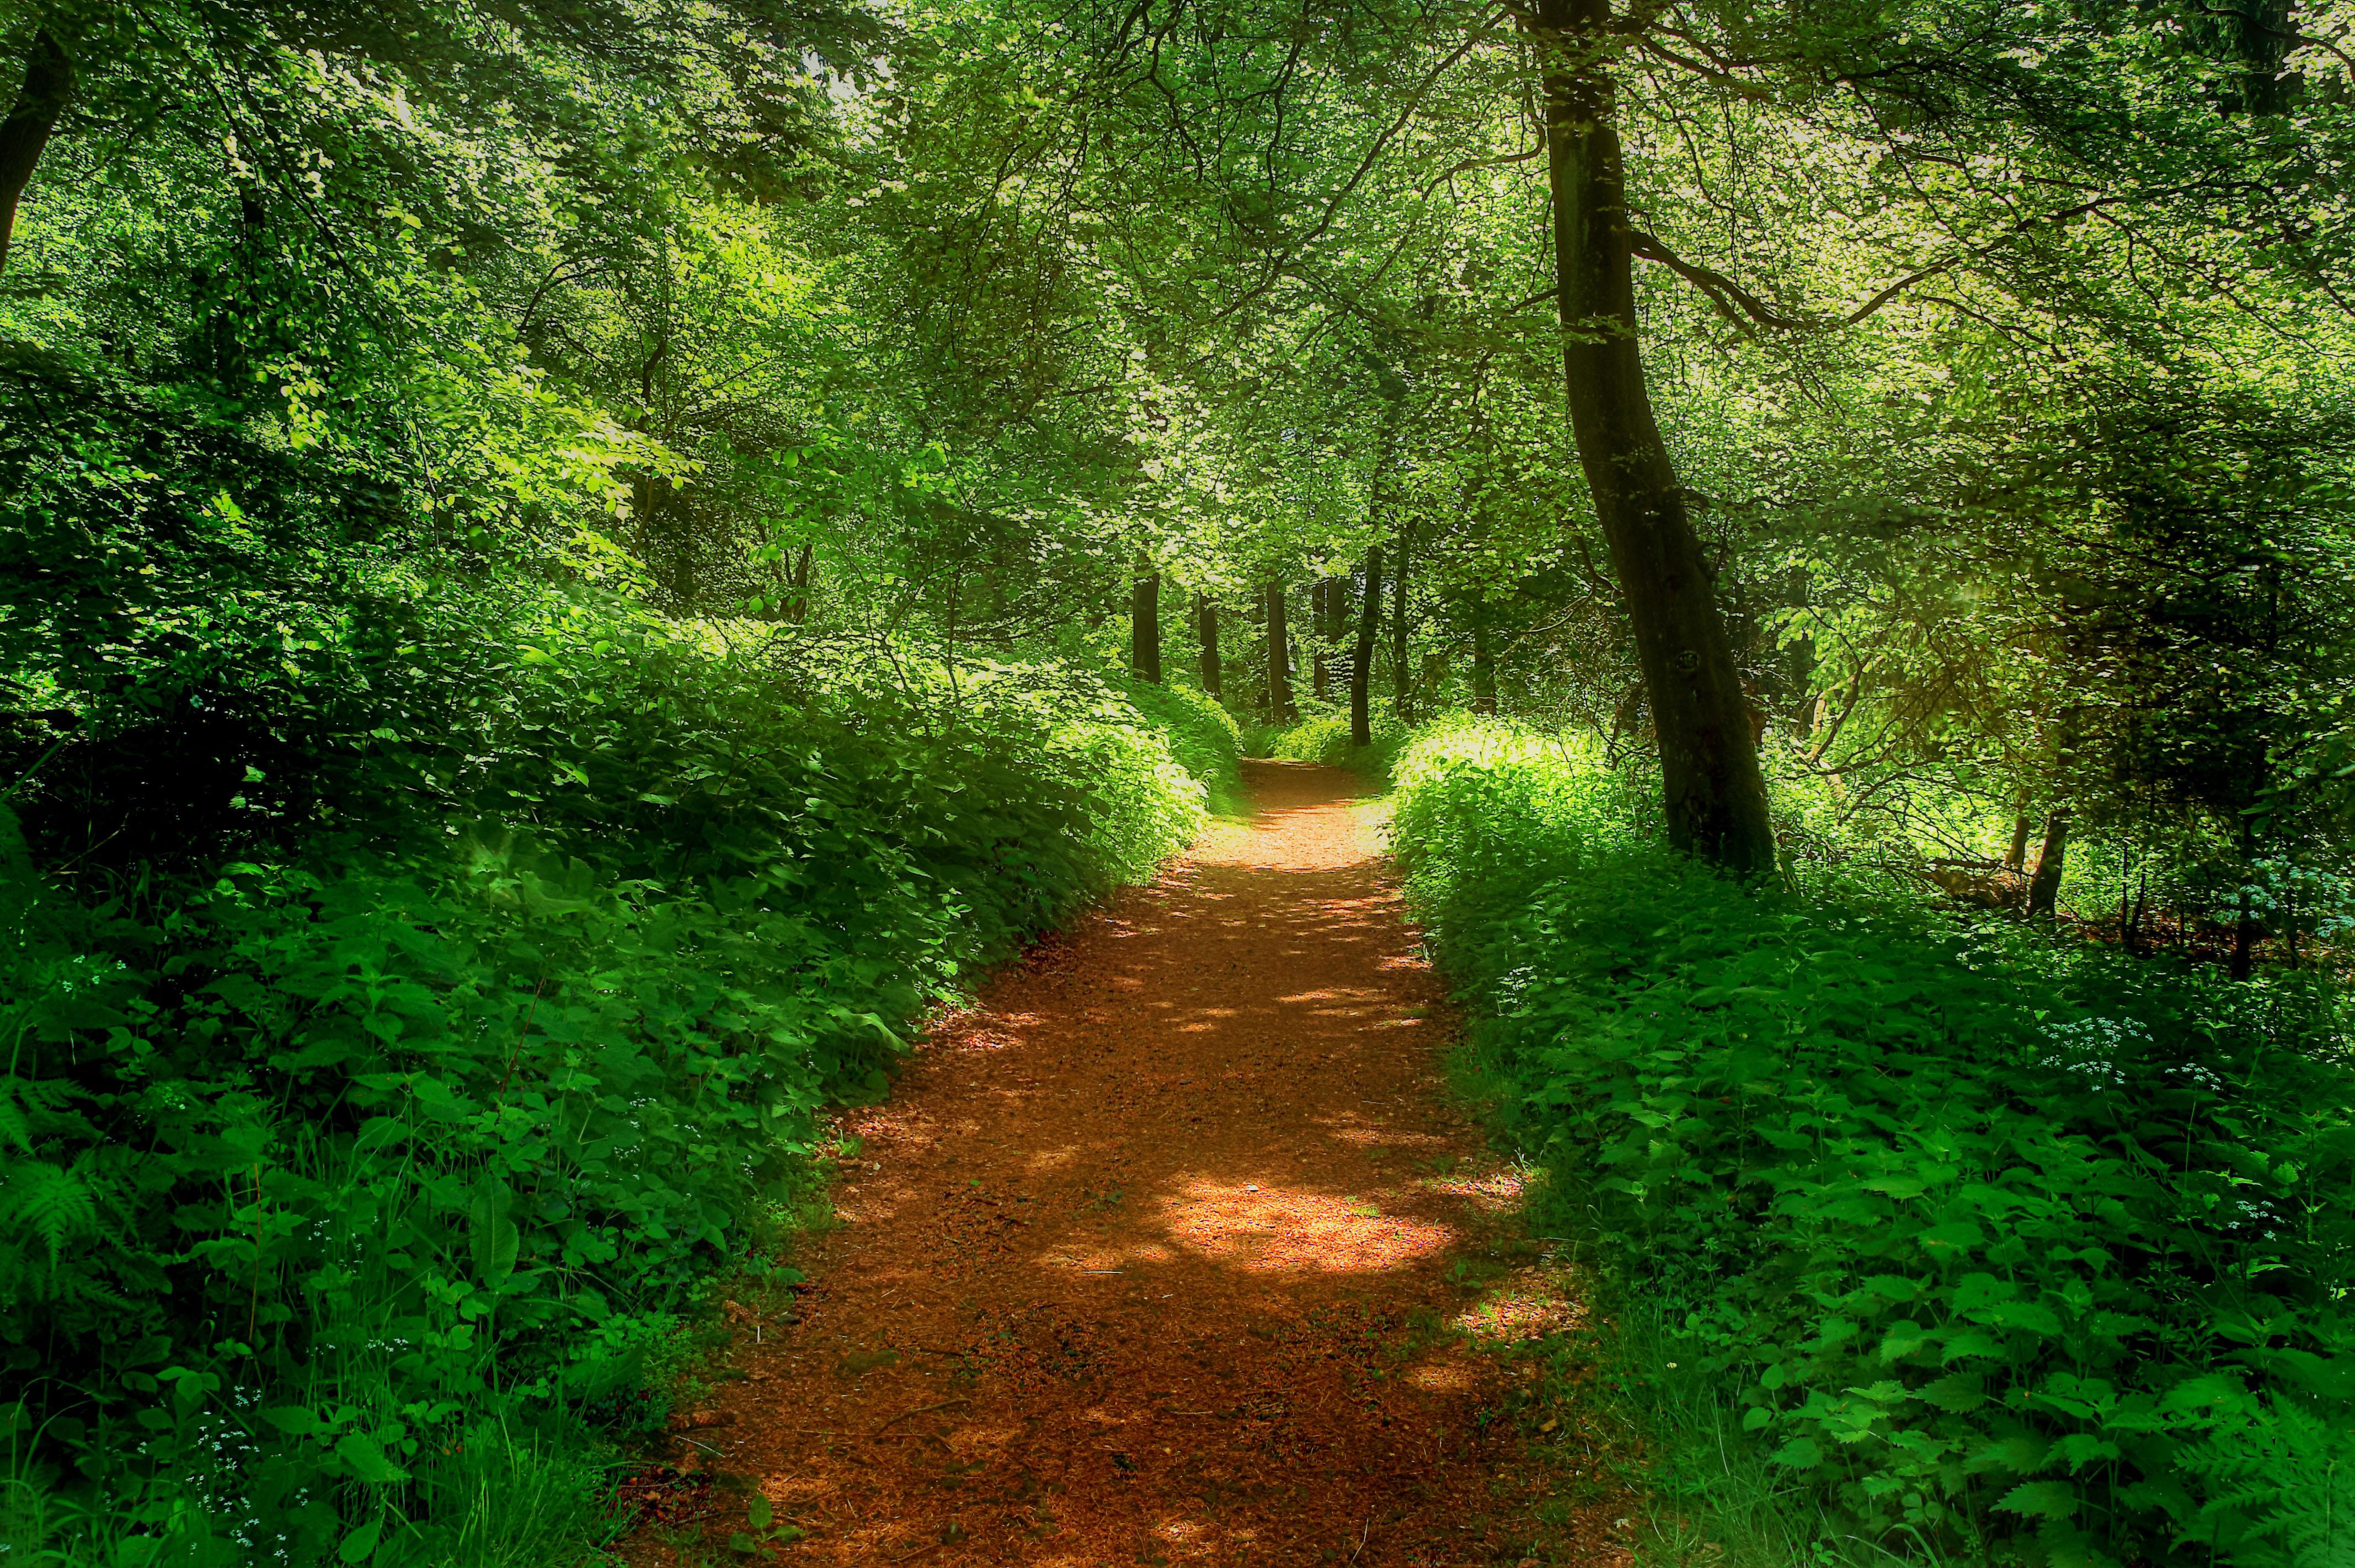 Forest road landscape wallpaper | 4269x2843 | 171976 ...